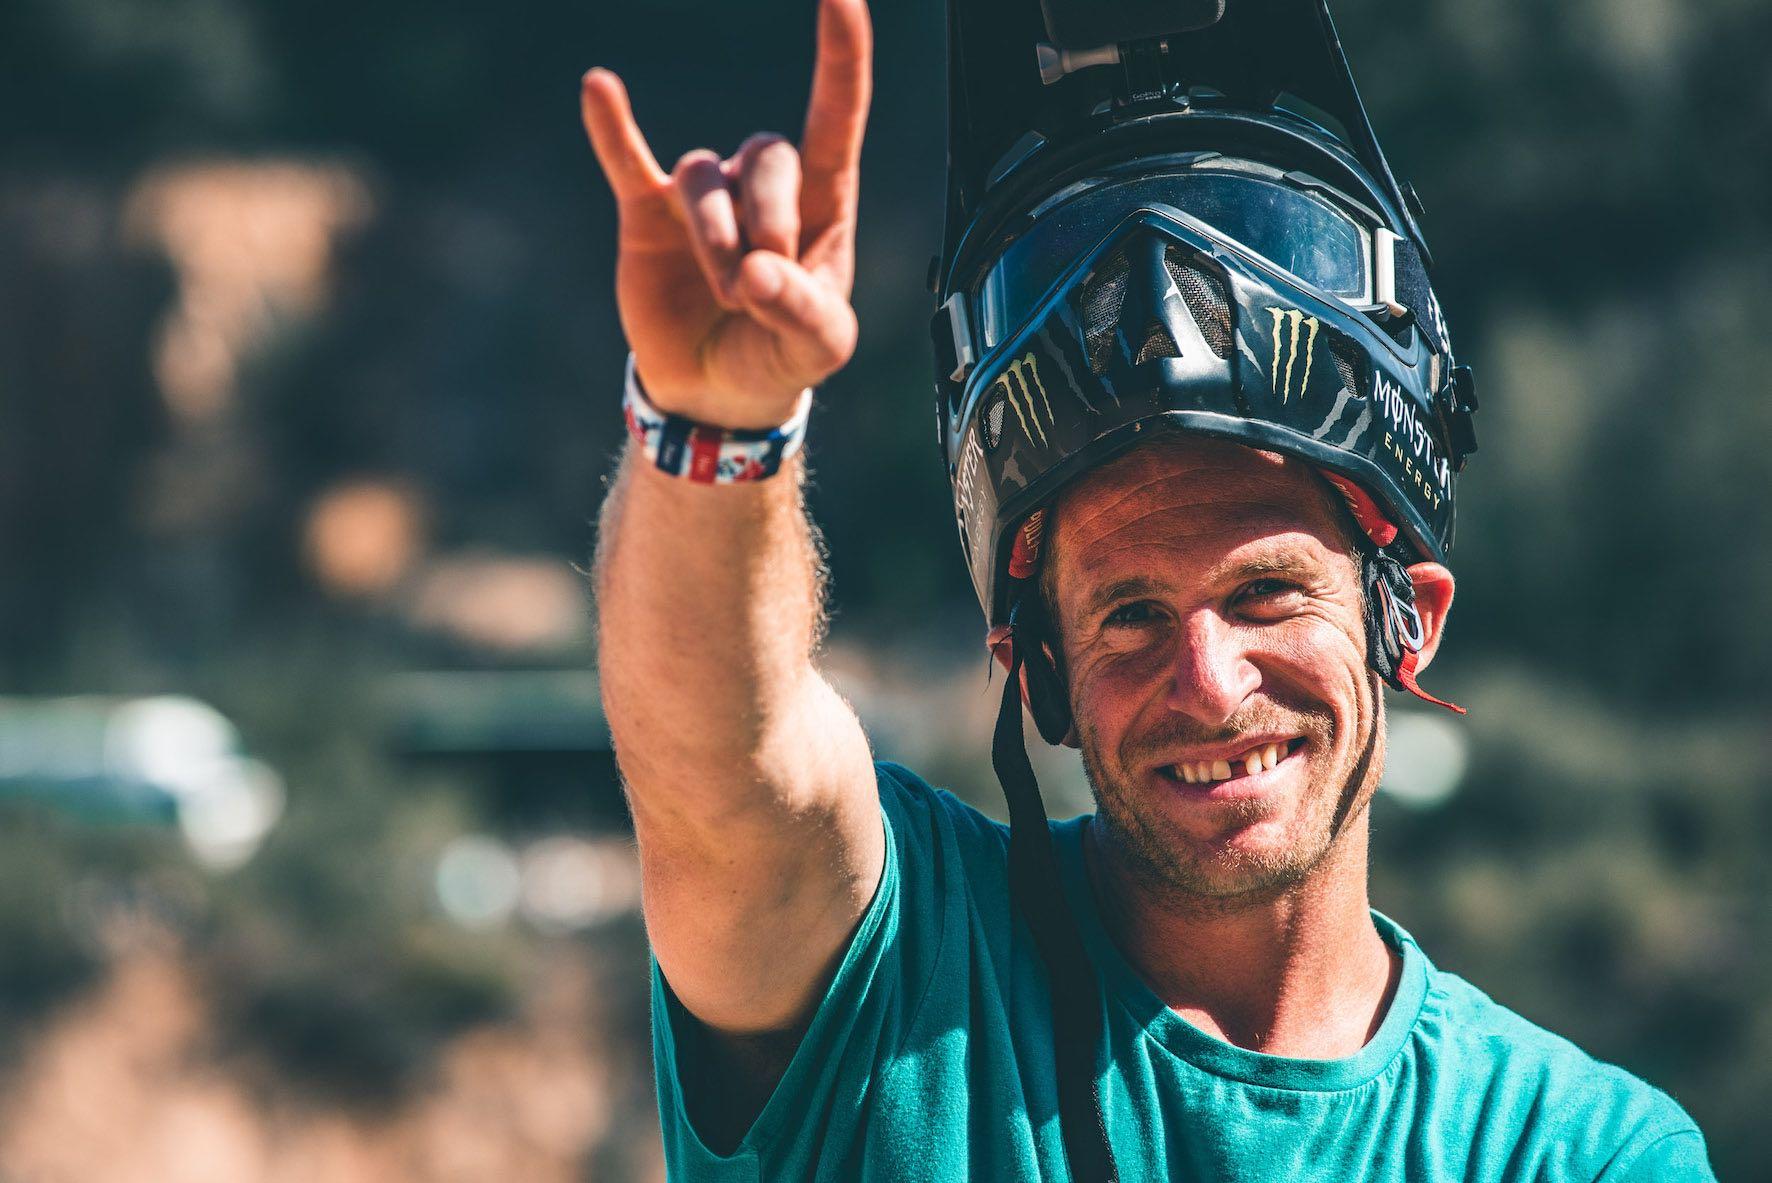 Audi Nines 2019 interview with Freeride MTB rider, Sam Pilgrim